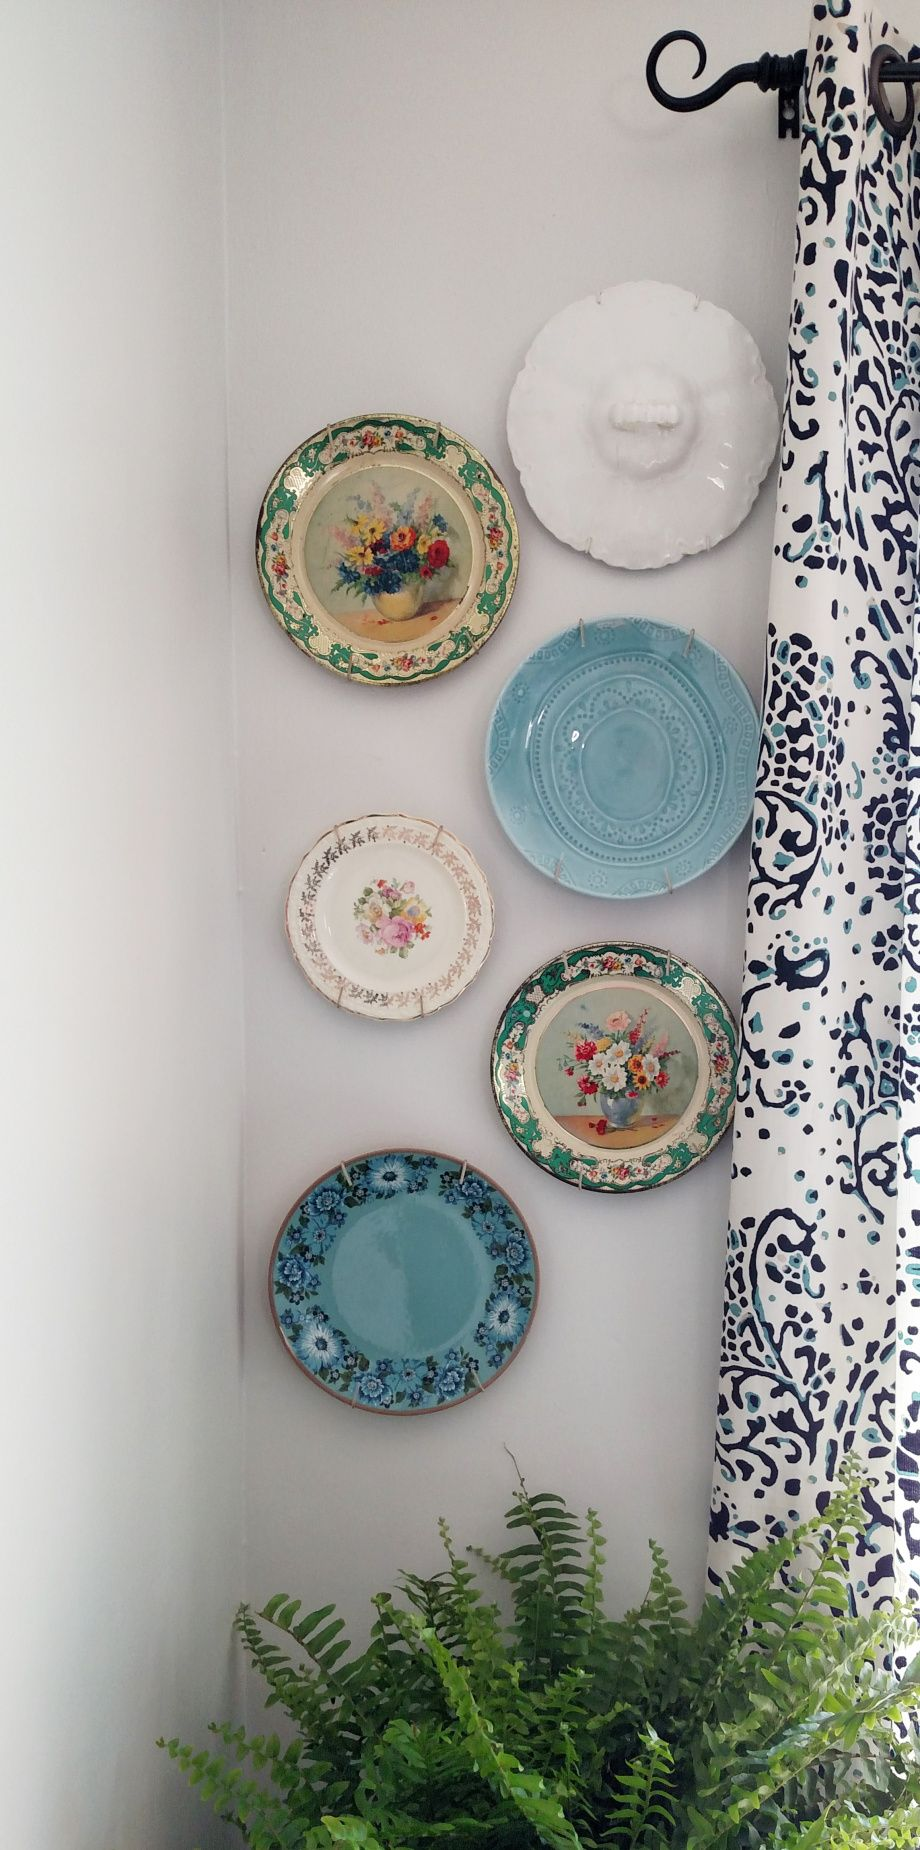 Vintage plate wall design inspiration.